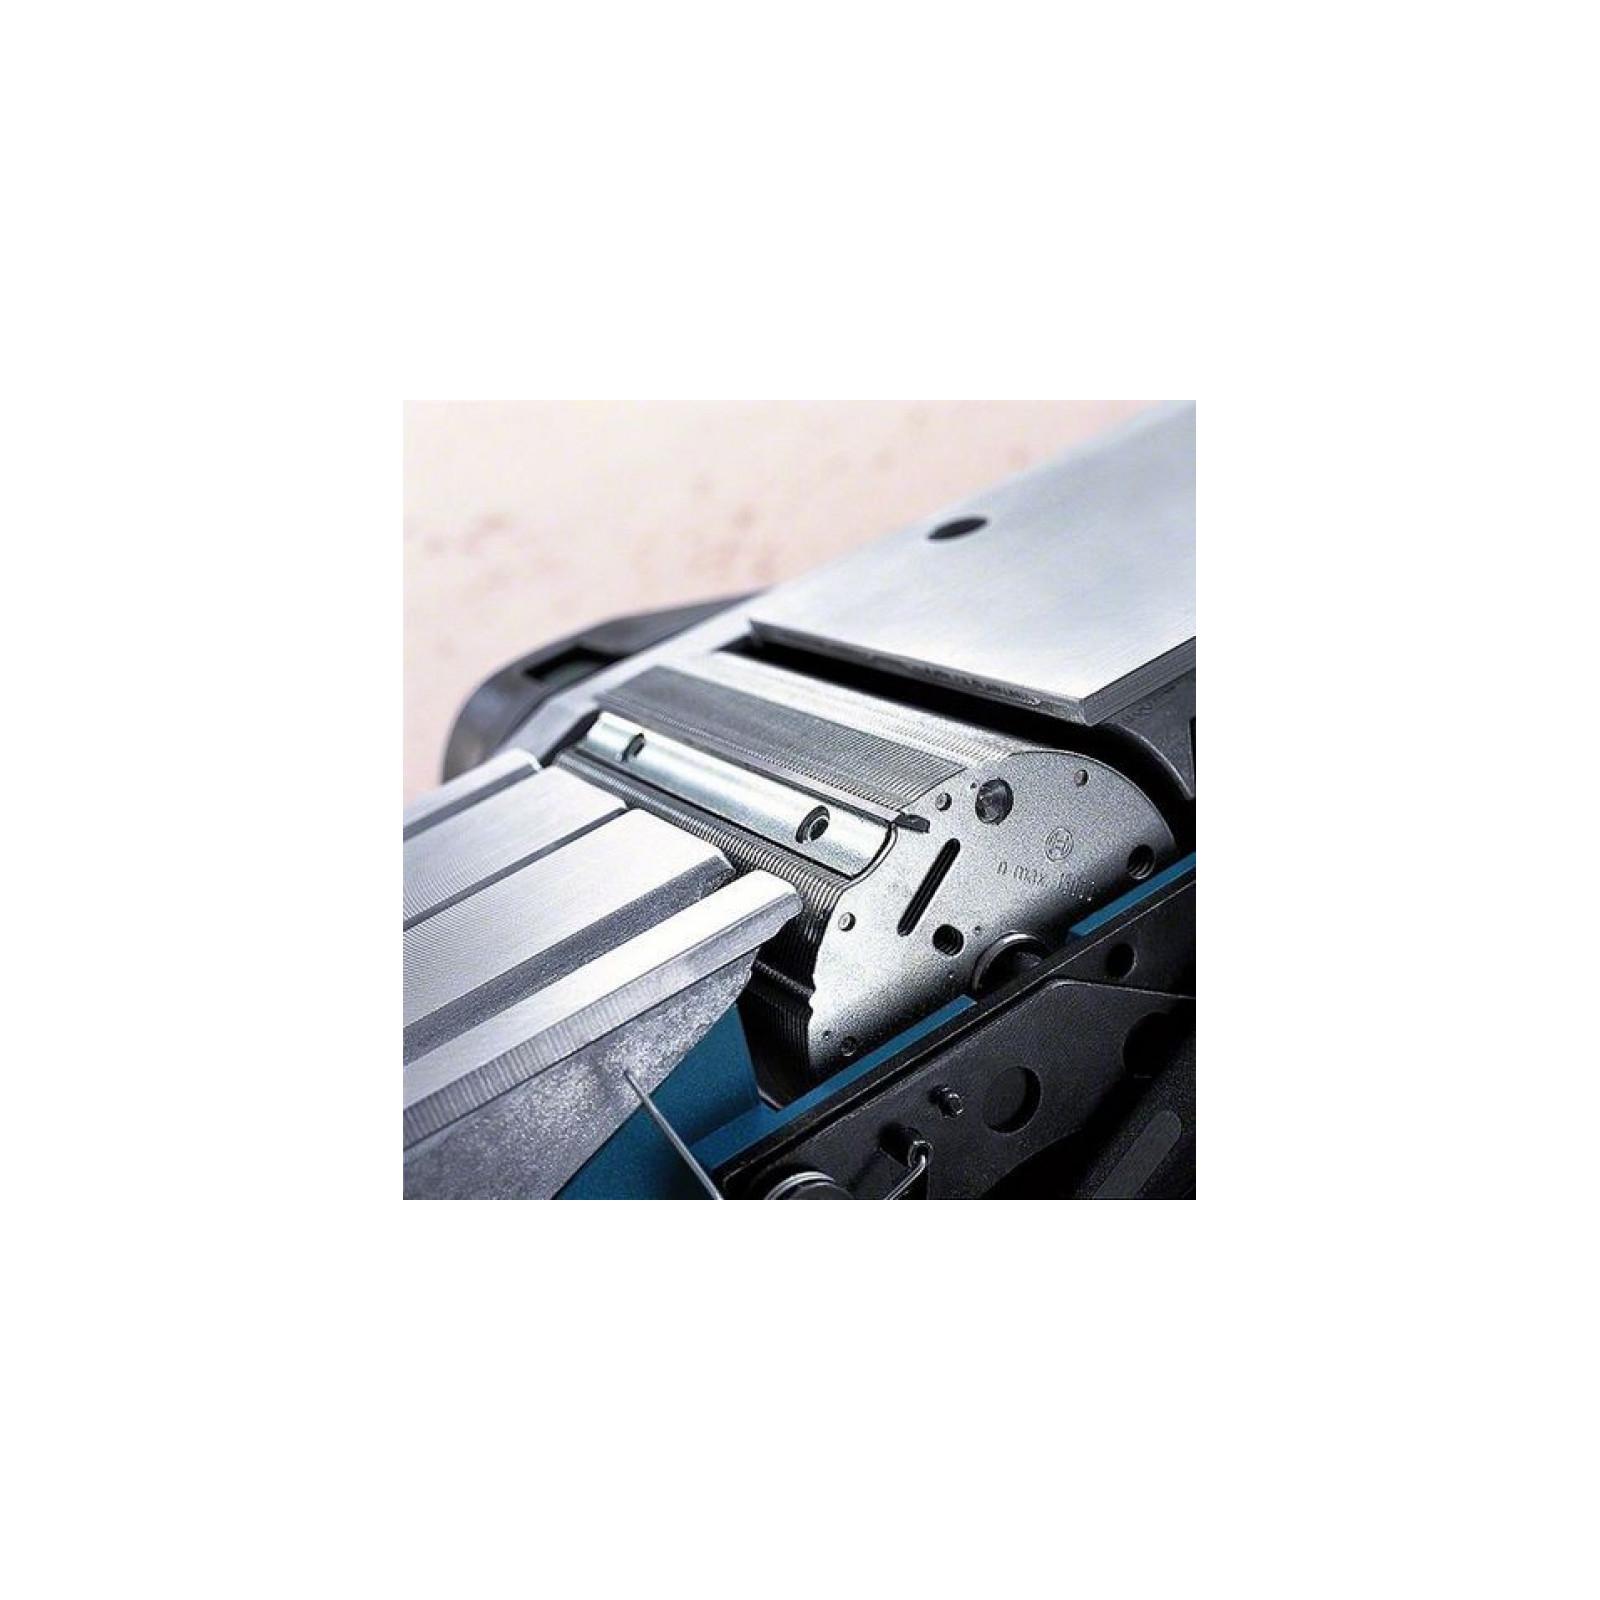 Электрорубанок Bosch GHO 40-82 C Professional (0.601.59A.760) изображение 10